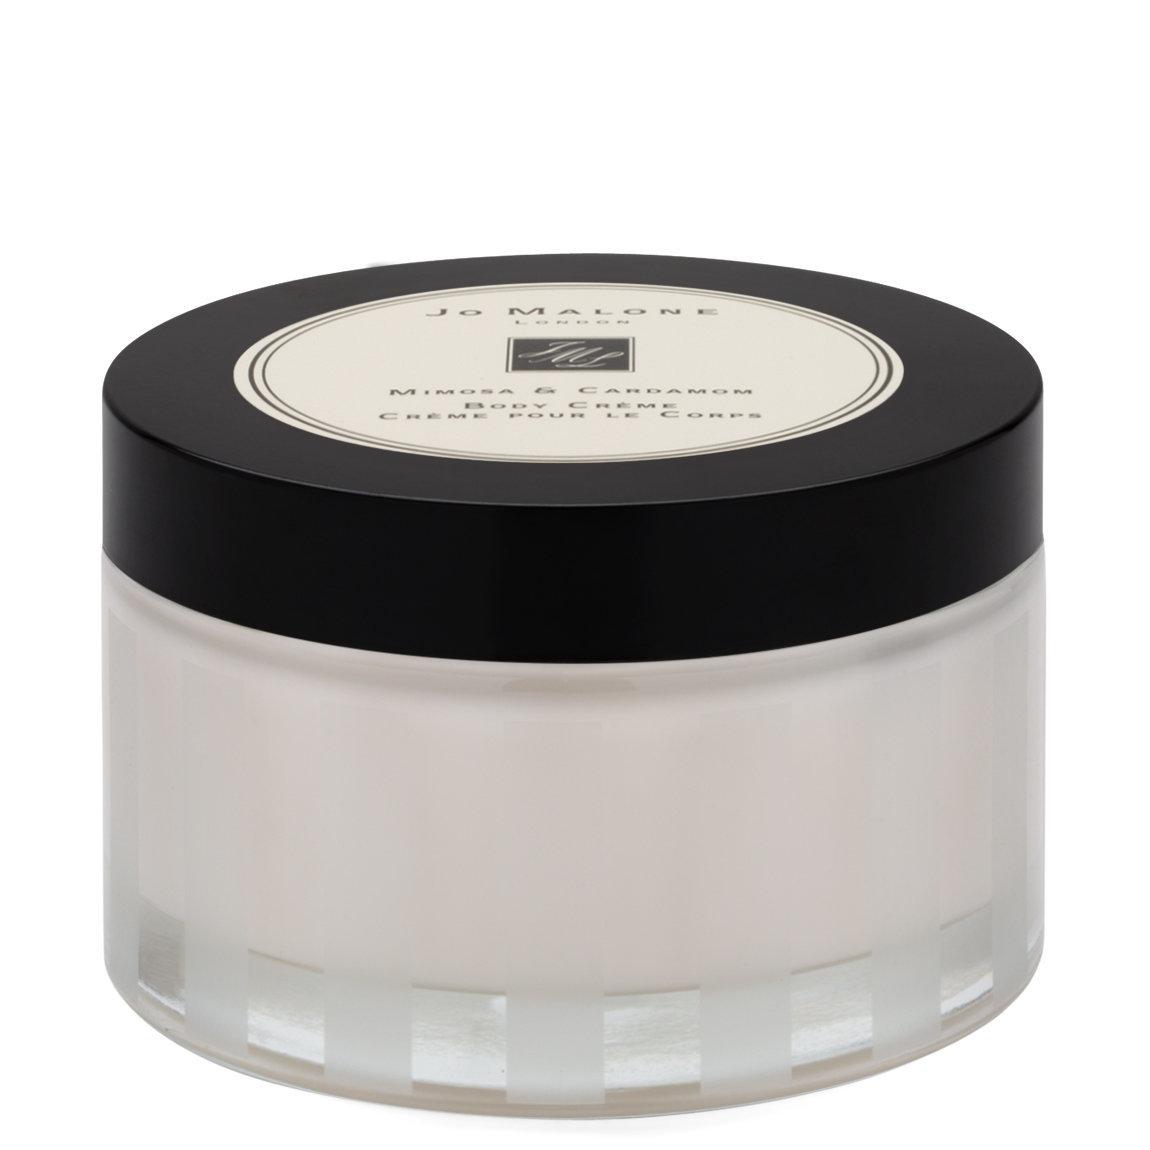 Jo Malone London Mimosa & Cardamom Body Crème alternative view 1 - product swatch.